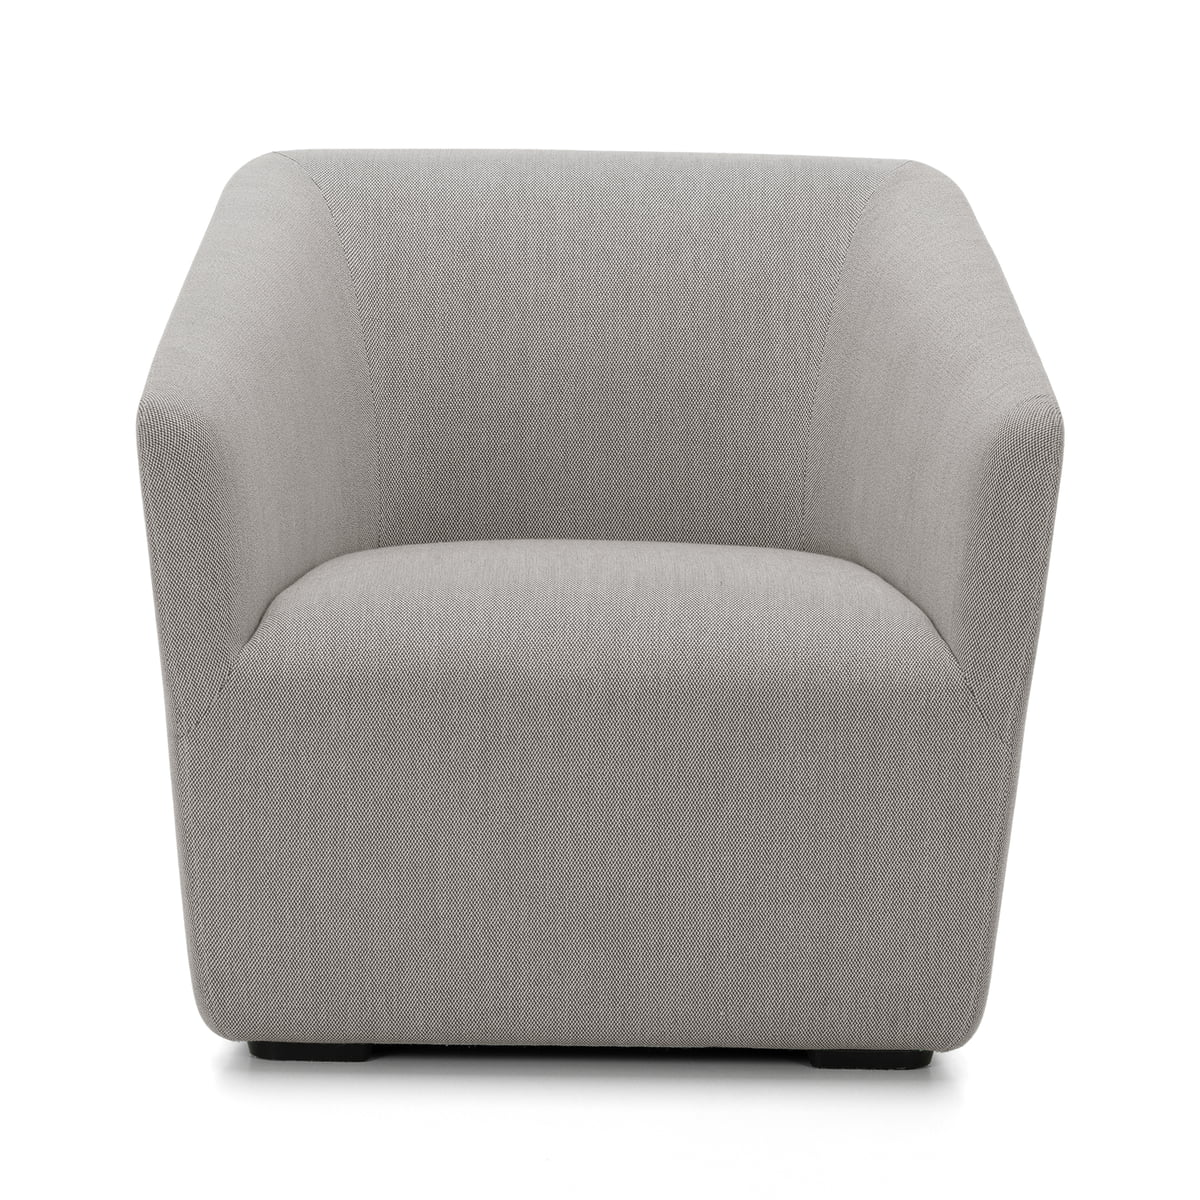 Vitra - Occasional Lounge Chair, hellgrau (stonegrey 13) | Wohnzimmer > Sessel | Stone (grau) | Vitra